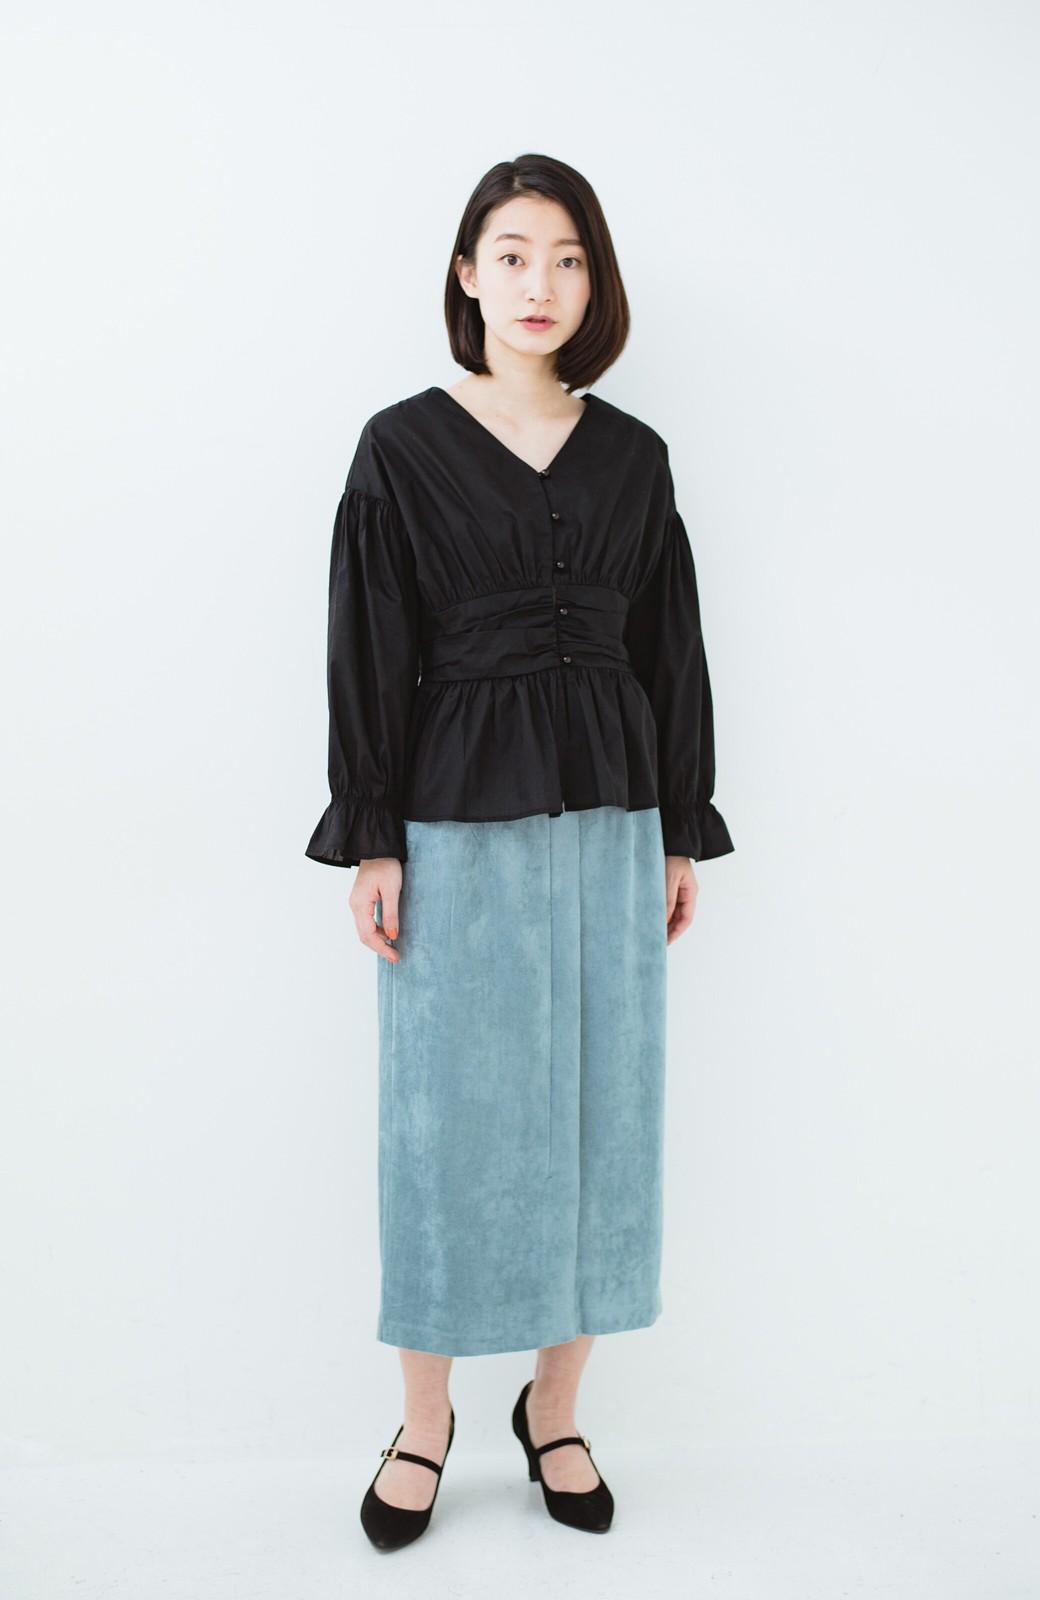 haco! 大人が安心して着られるタイトスカート by que made me <グレイッシュブルー>の商品写真11